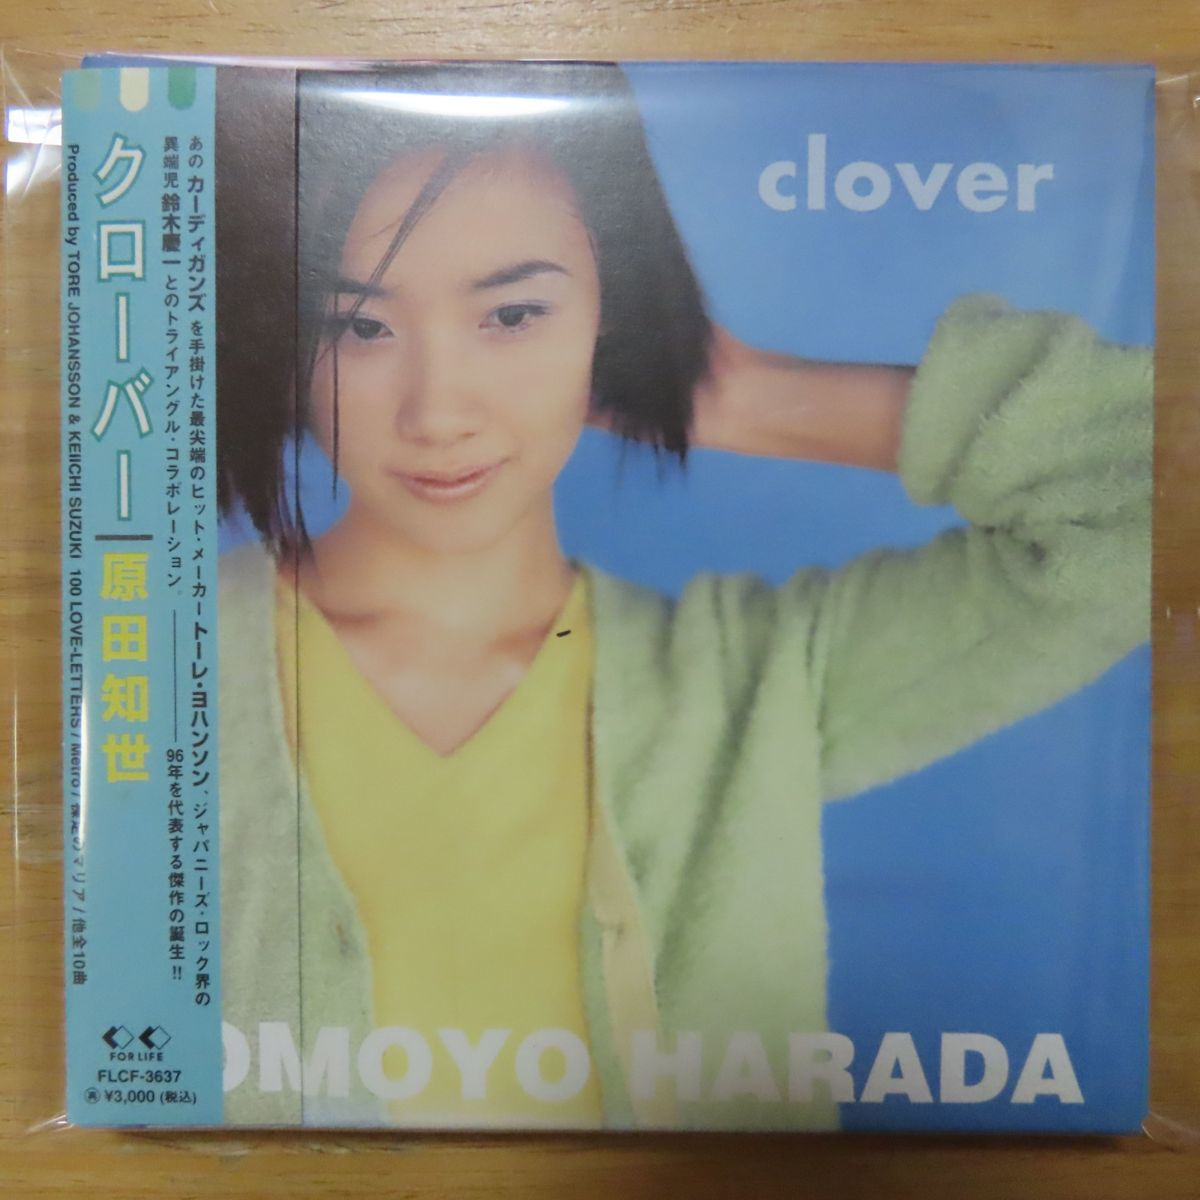 4988018308560;【CD/鈴木慶一参加】原田知世 / クローバー